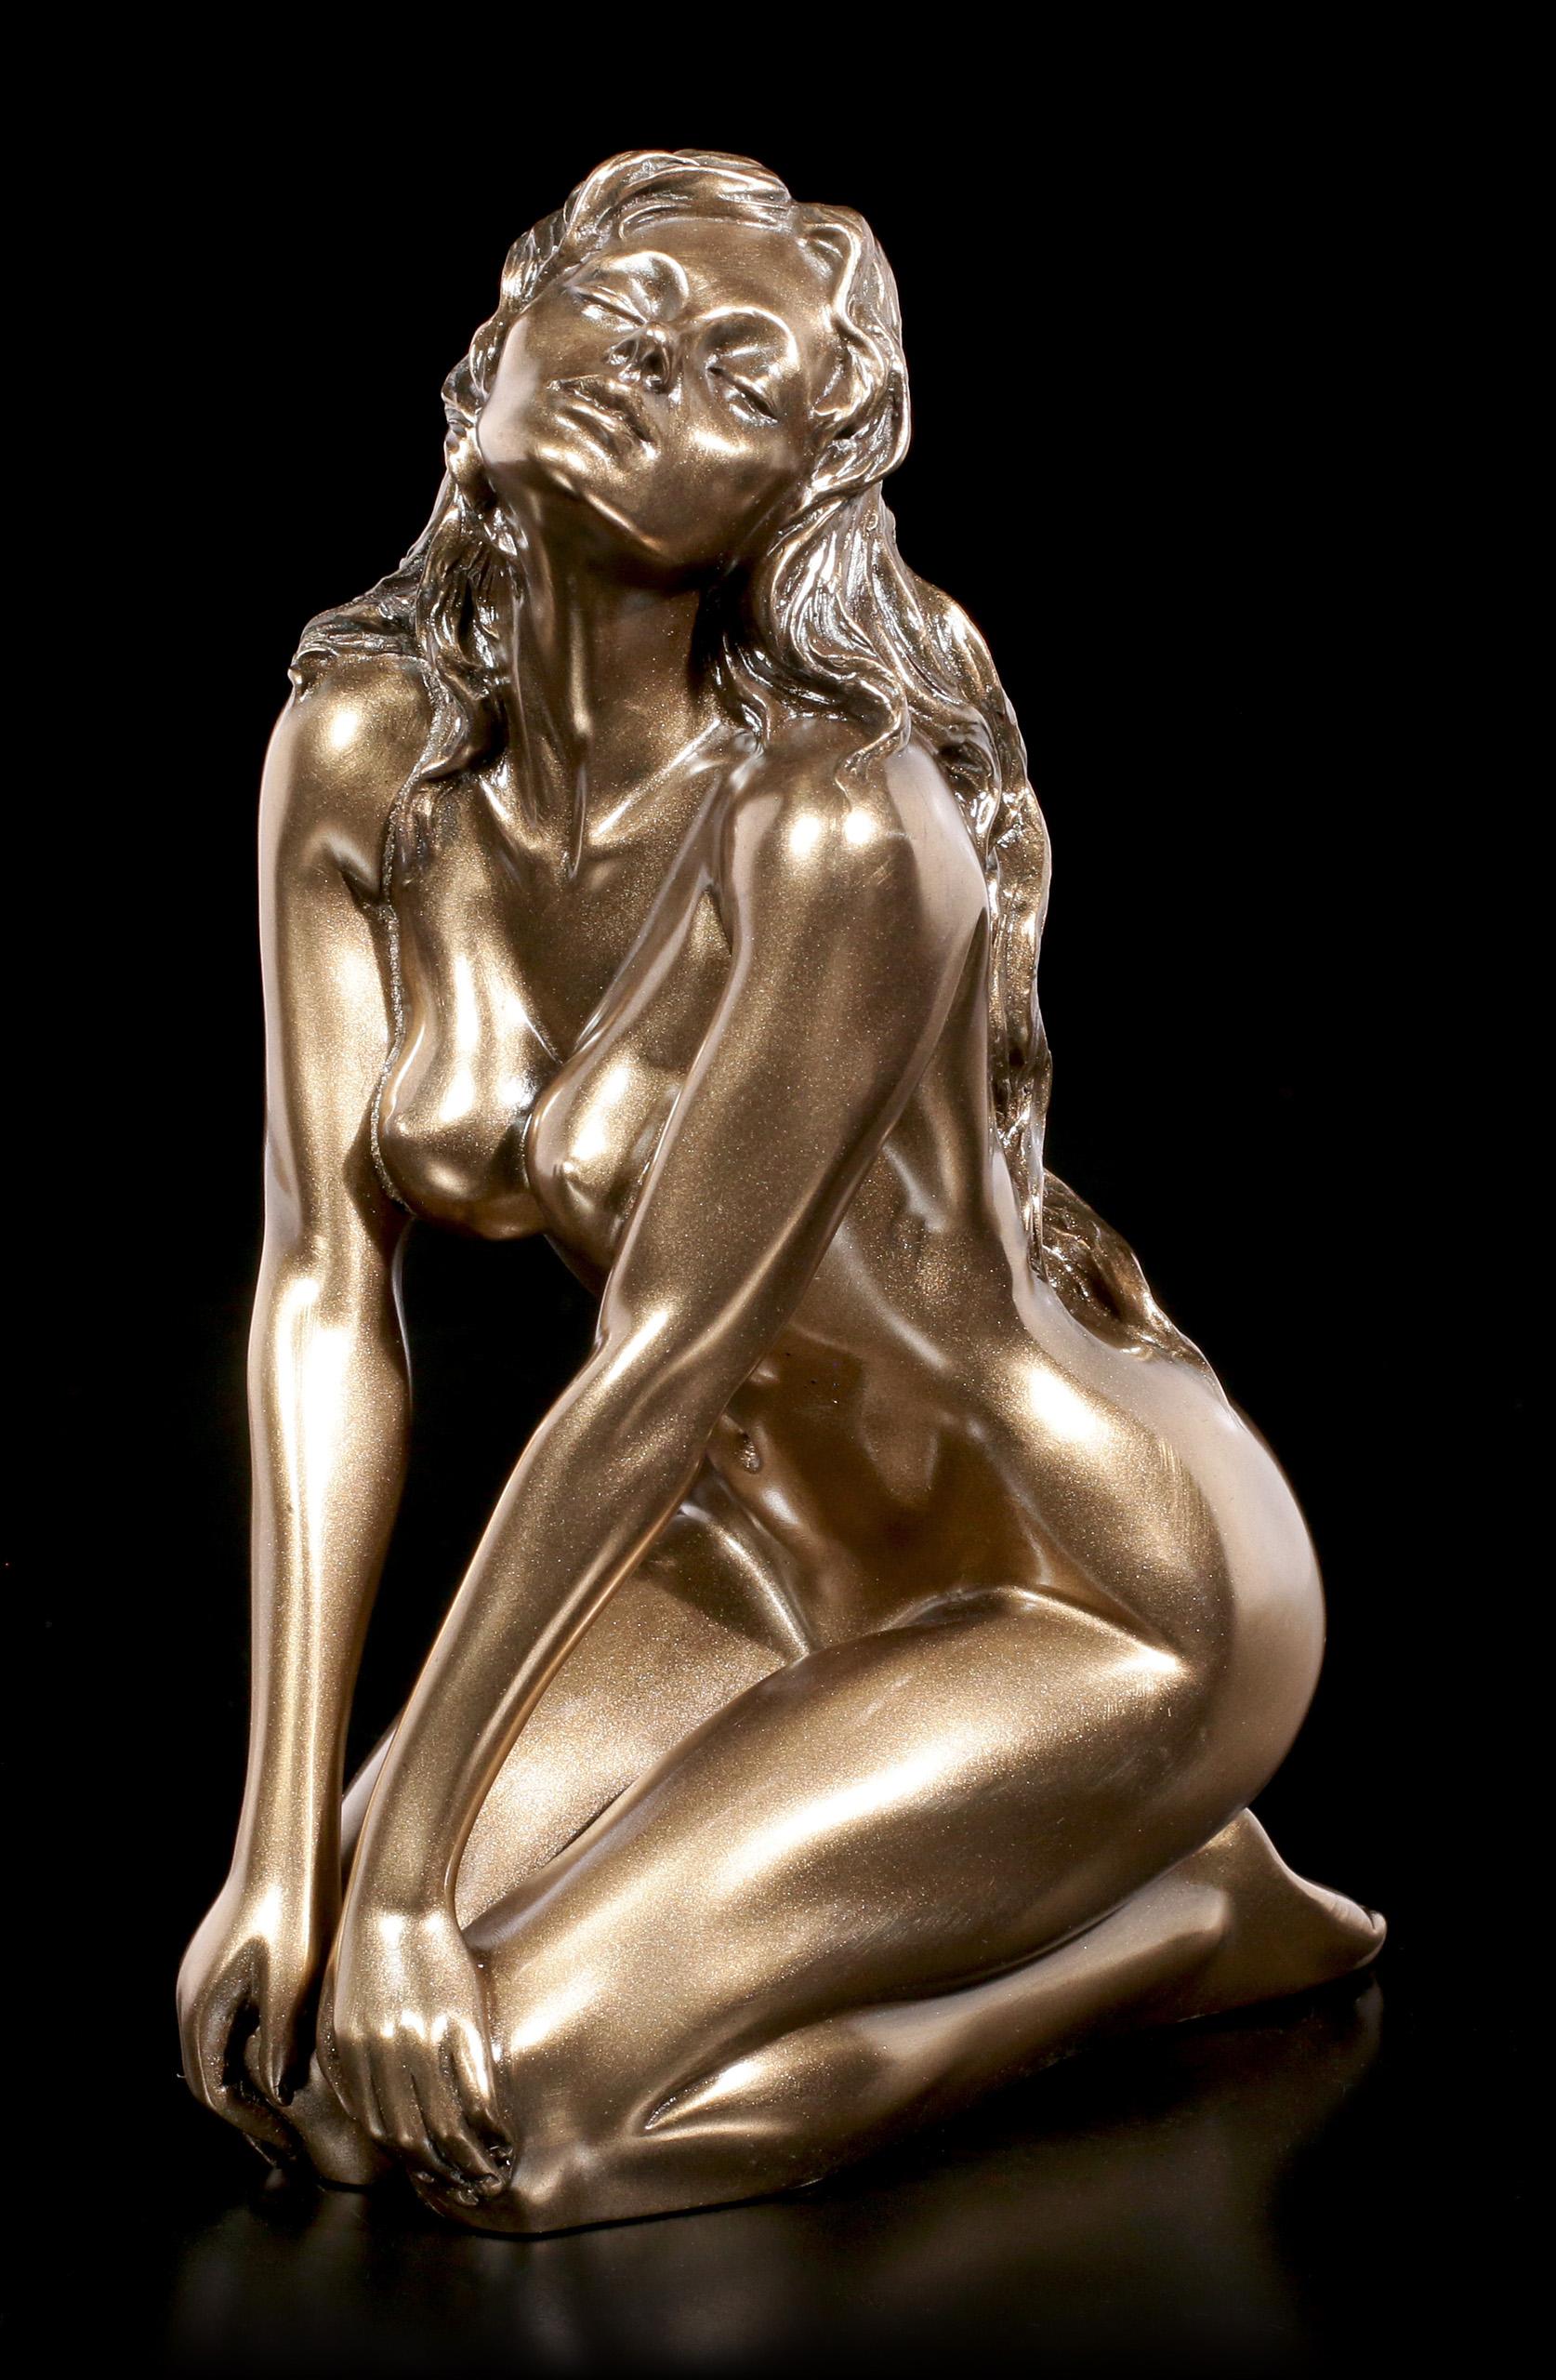 Figurine Nude Woman Kneeling Harmony arms Head Bronzed Sculpture by Veronese